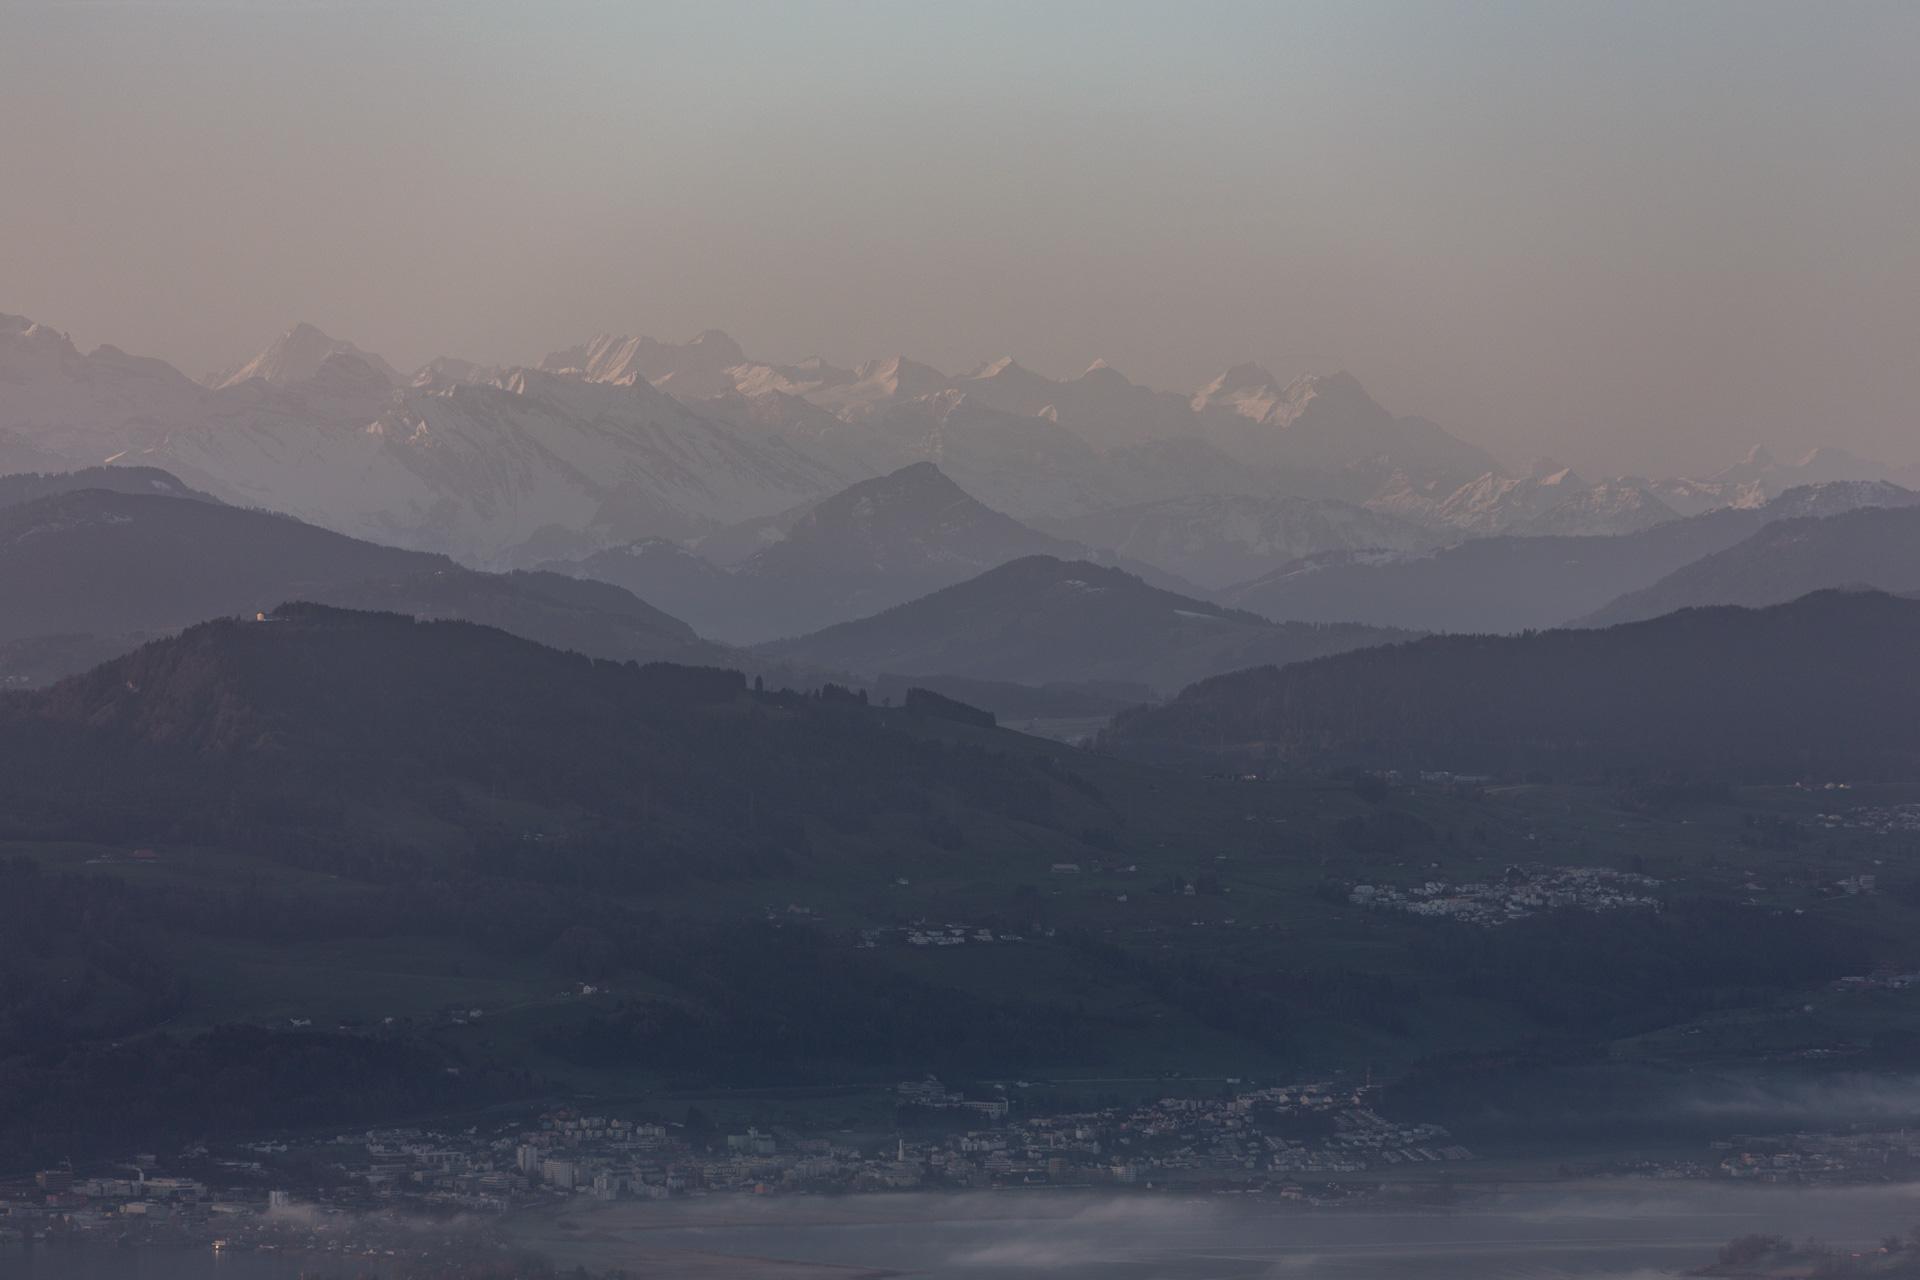 Sonnenaufgang-Bachtelturm_20151219_6019-1